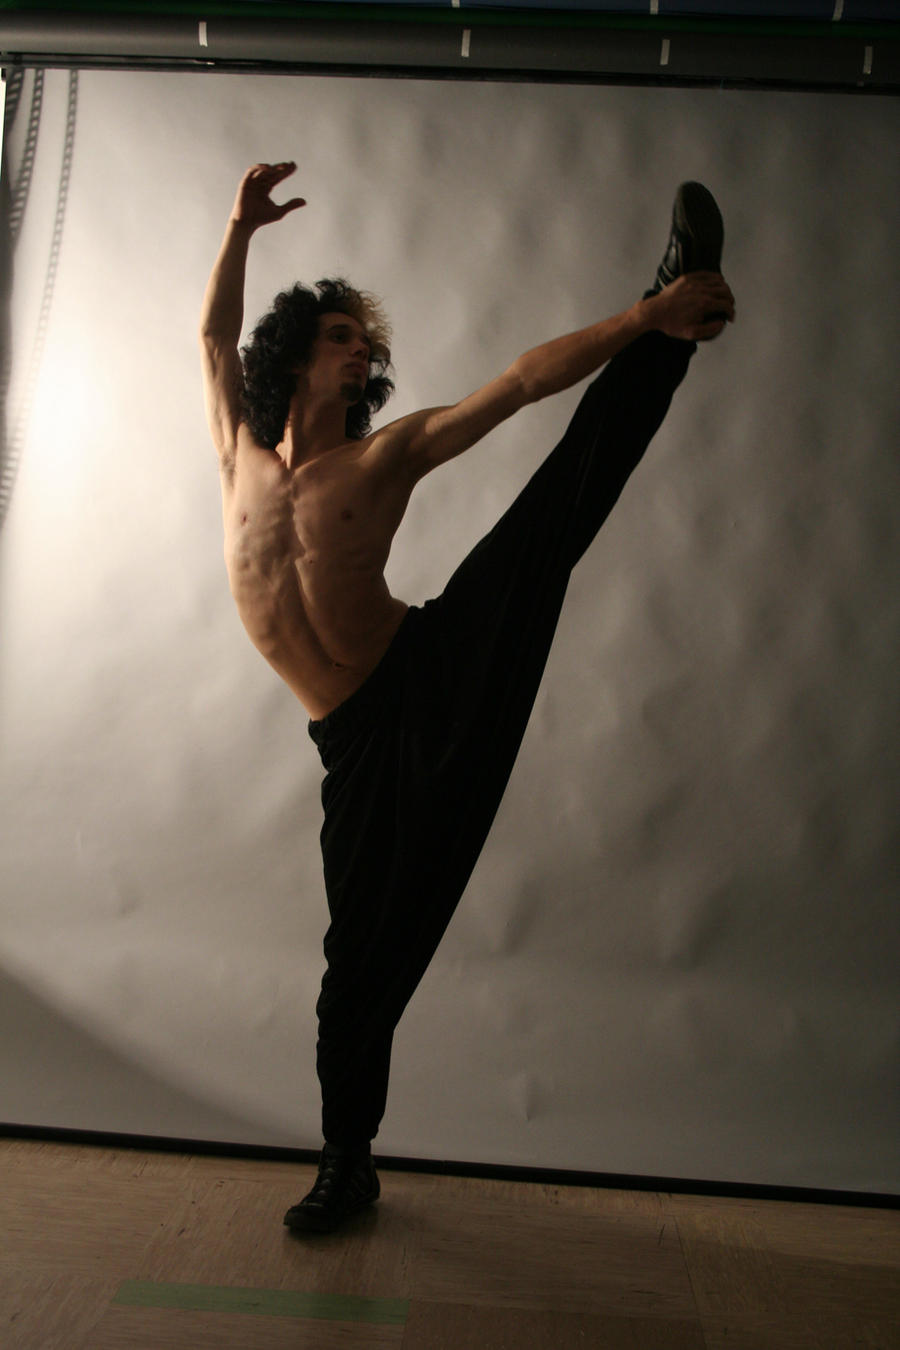 Dance1 by DaeStock